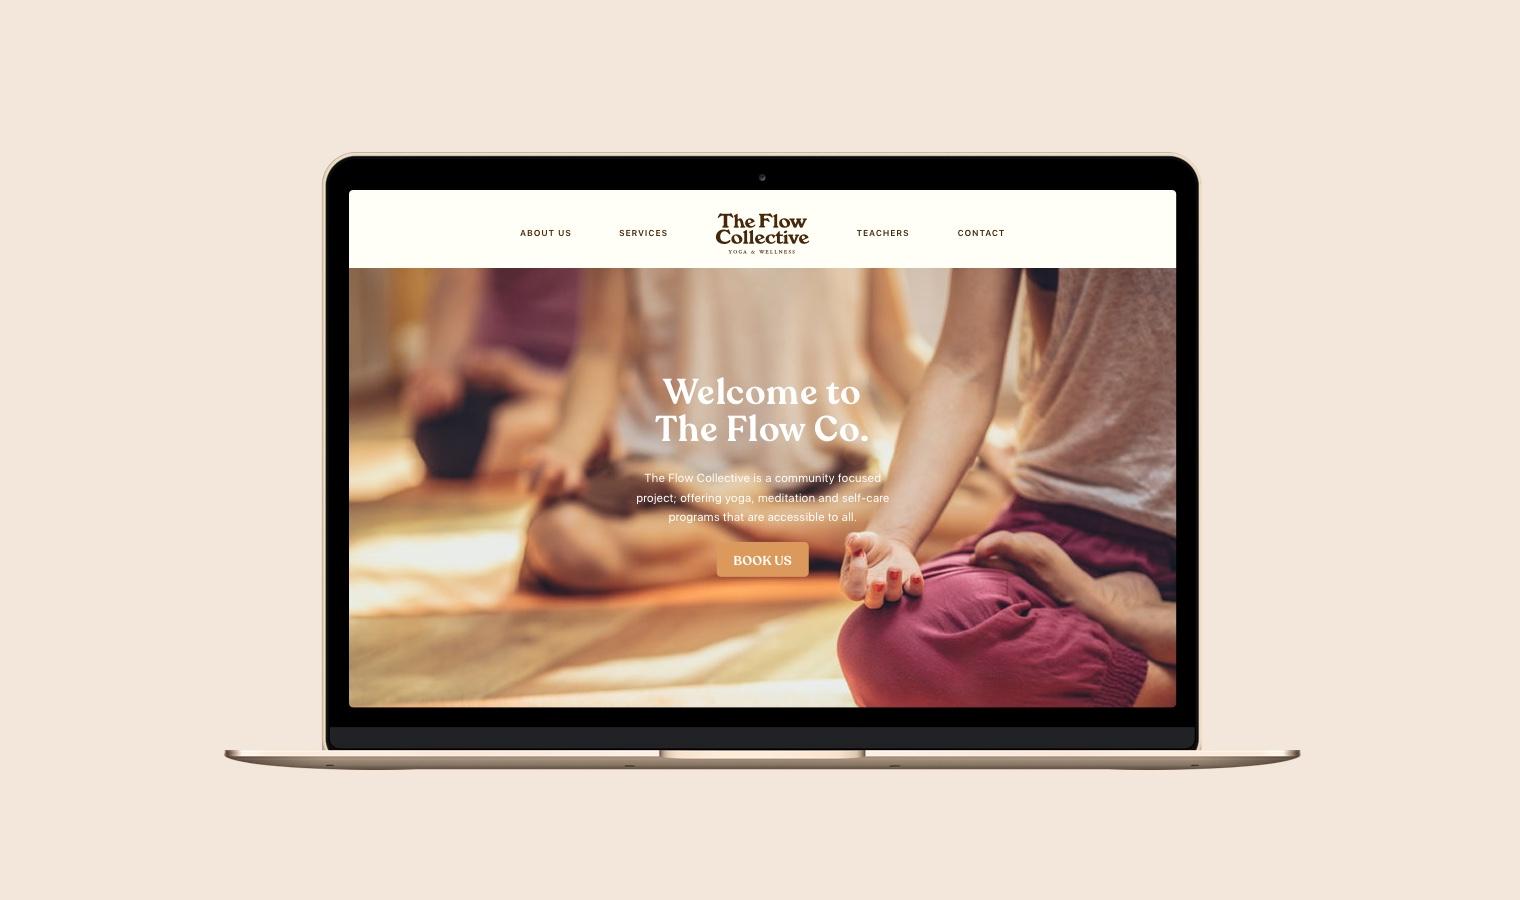 The-Flow-Collective-Yoga-Wellness-Meditation-Branding-04.jpg